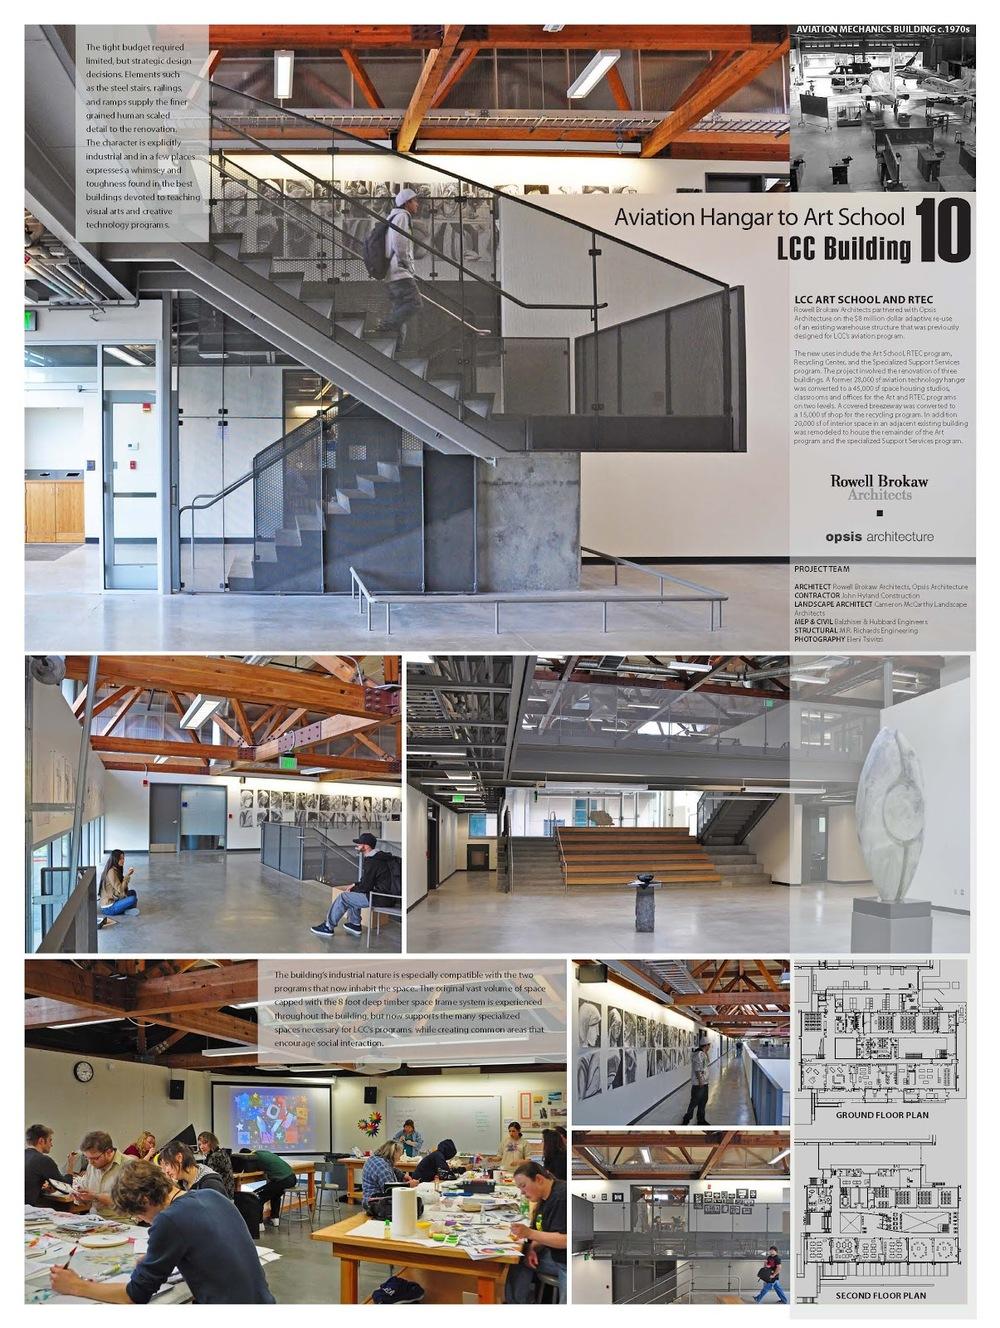 LCC_Building10.jpg